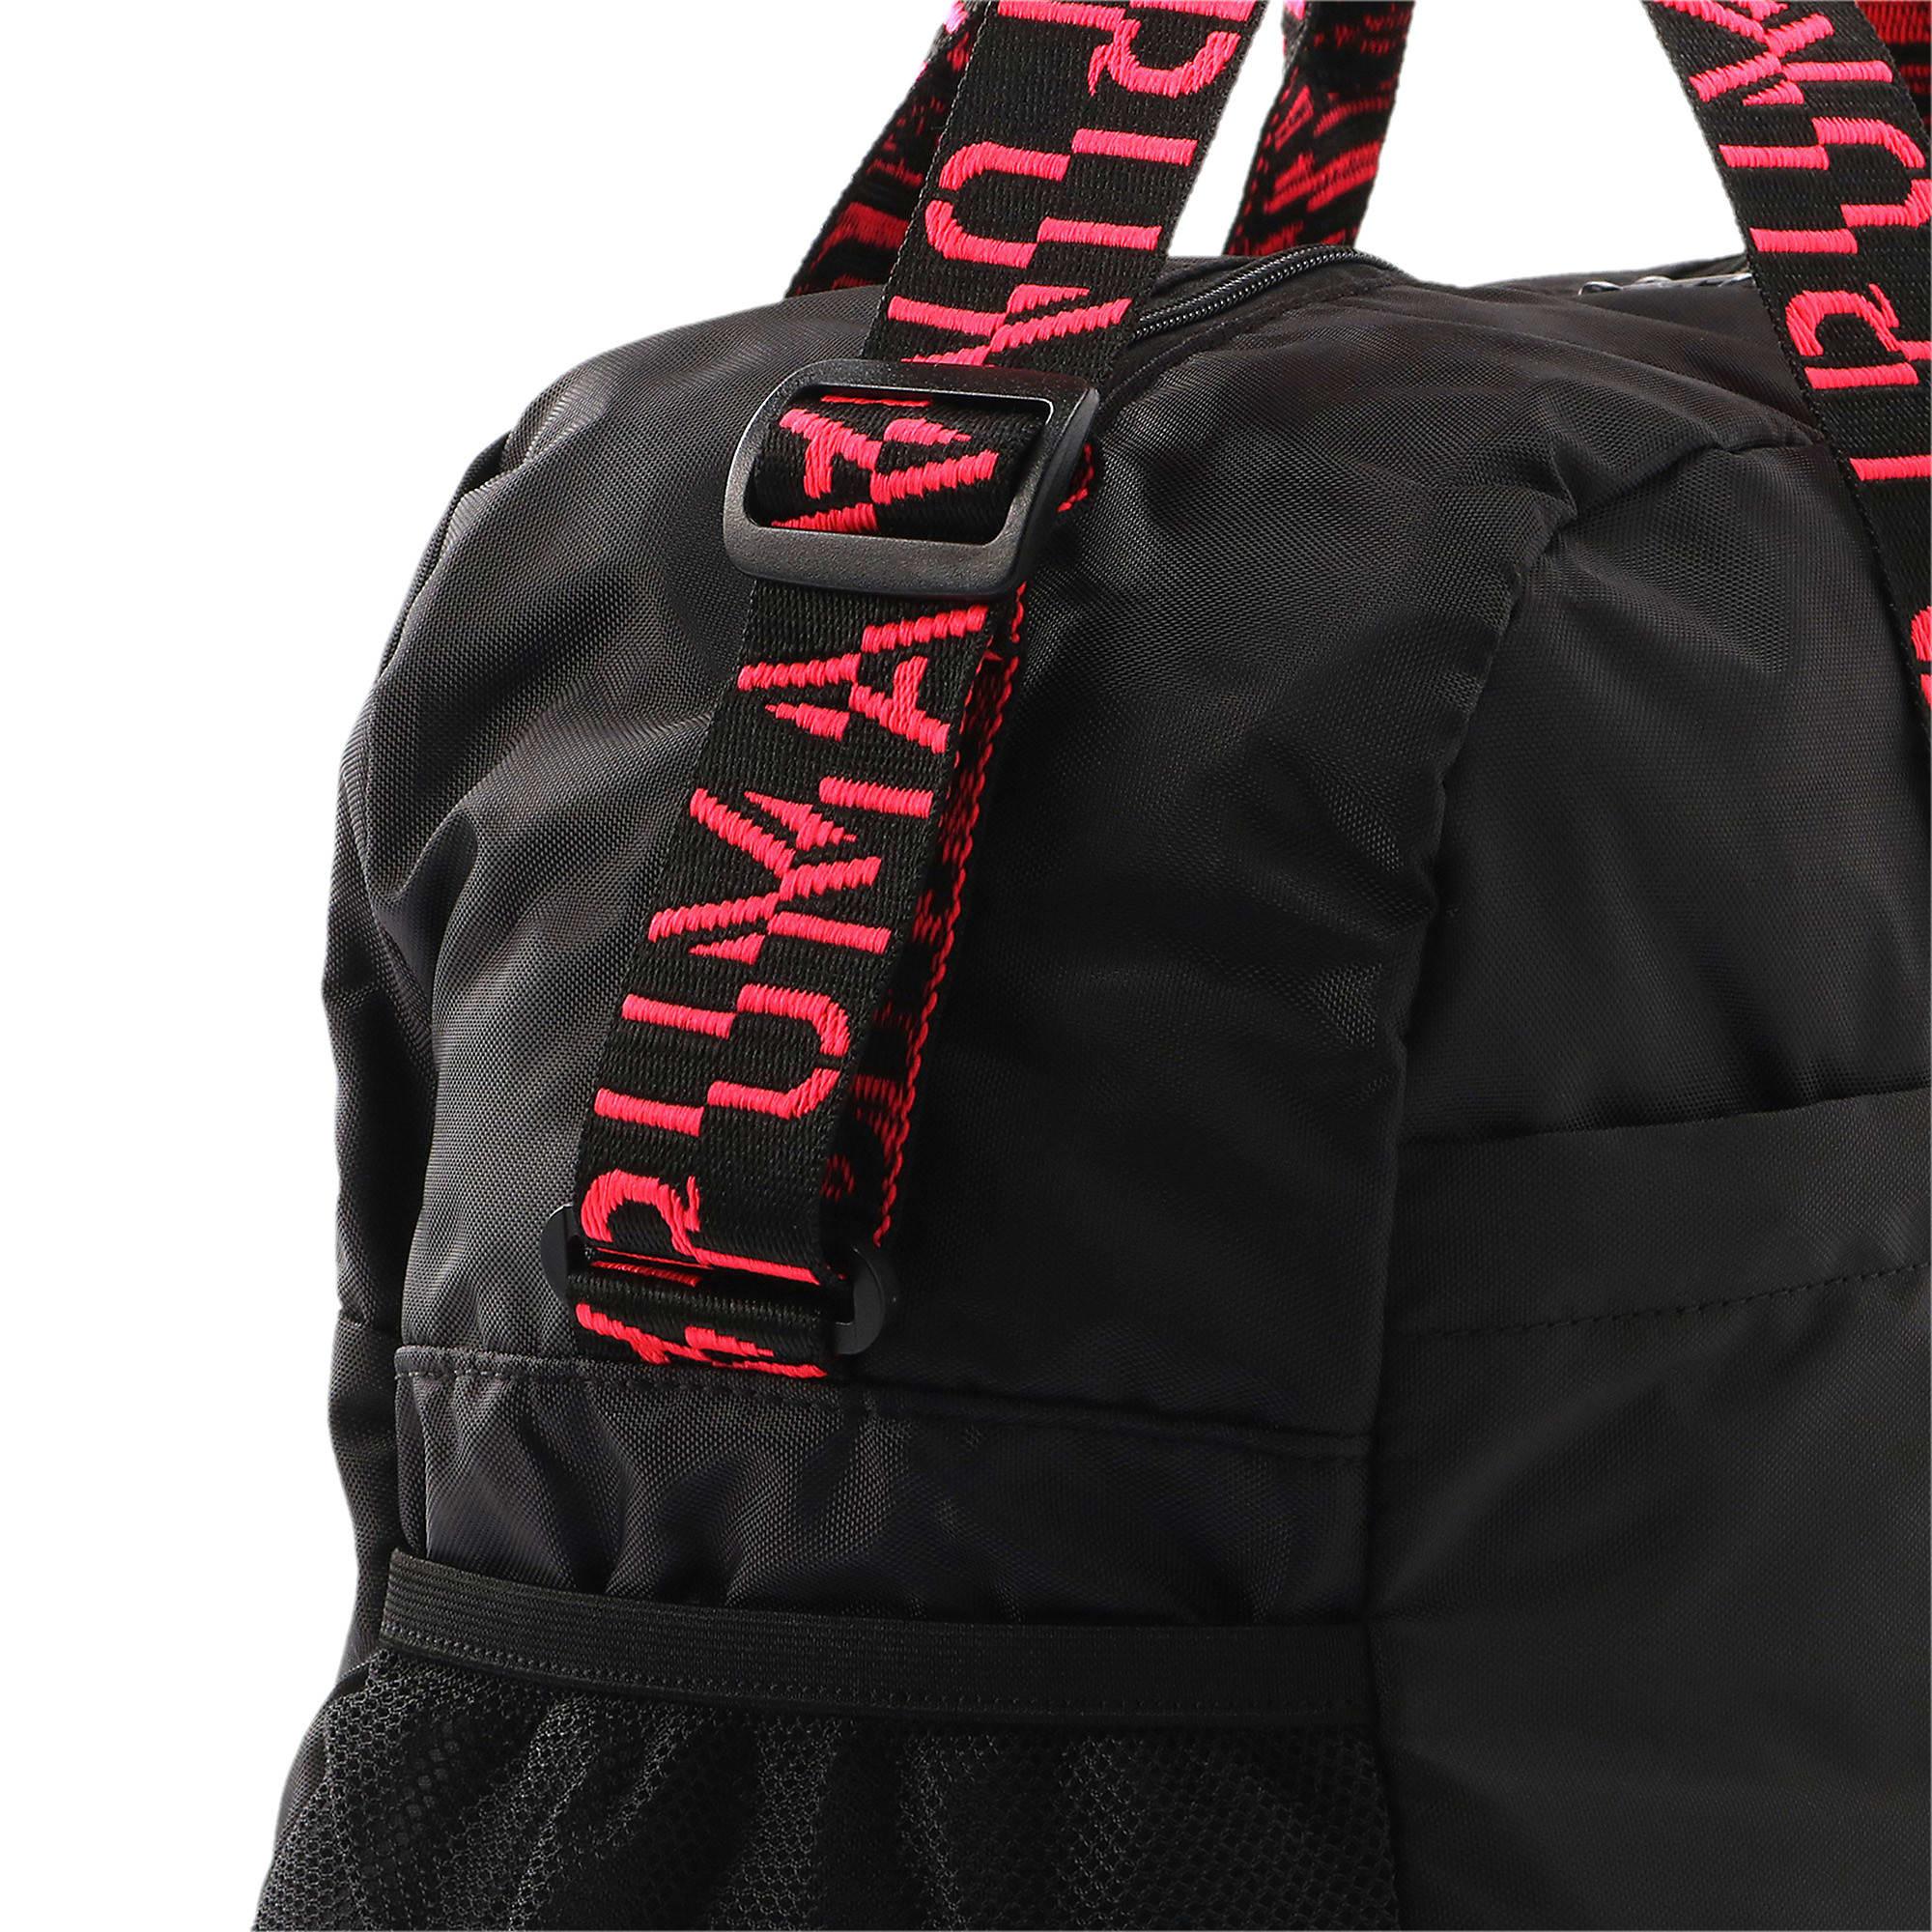 Thumbnail 7 of トレーニング AT エッセンシャル ウィメンズ ダッフル バッグ 30L, Puma Black-Pink Alert-AOP, medium-JPN